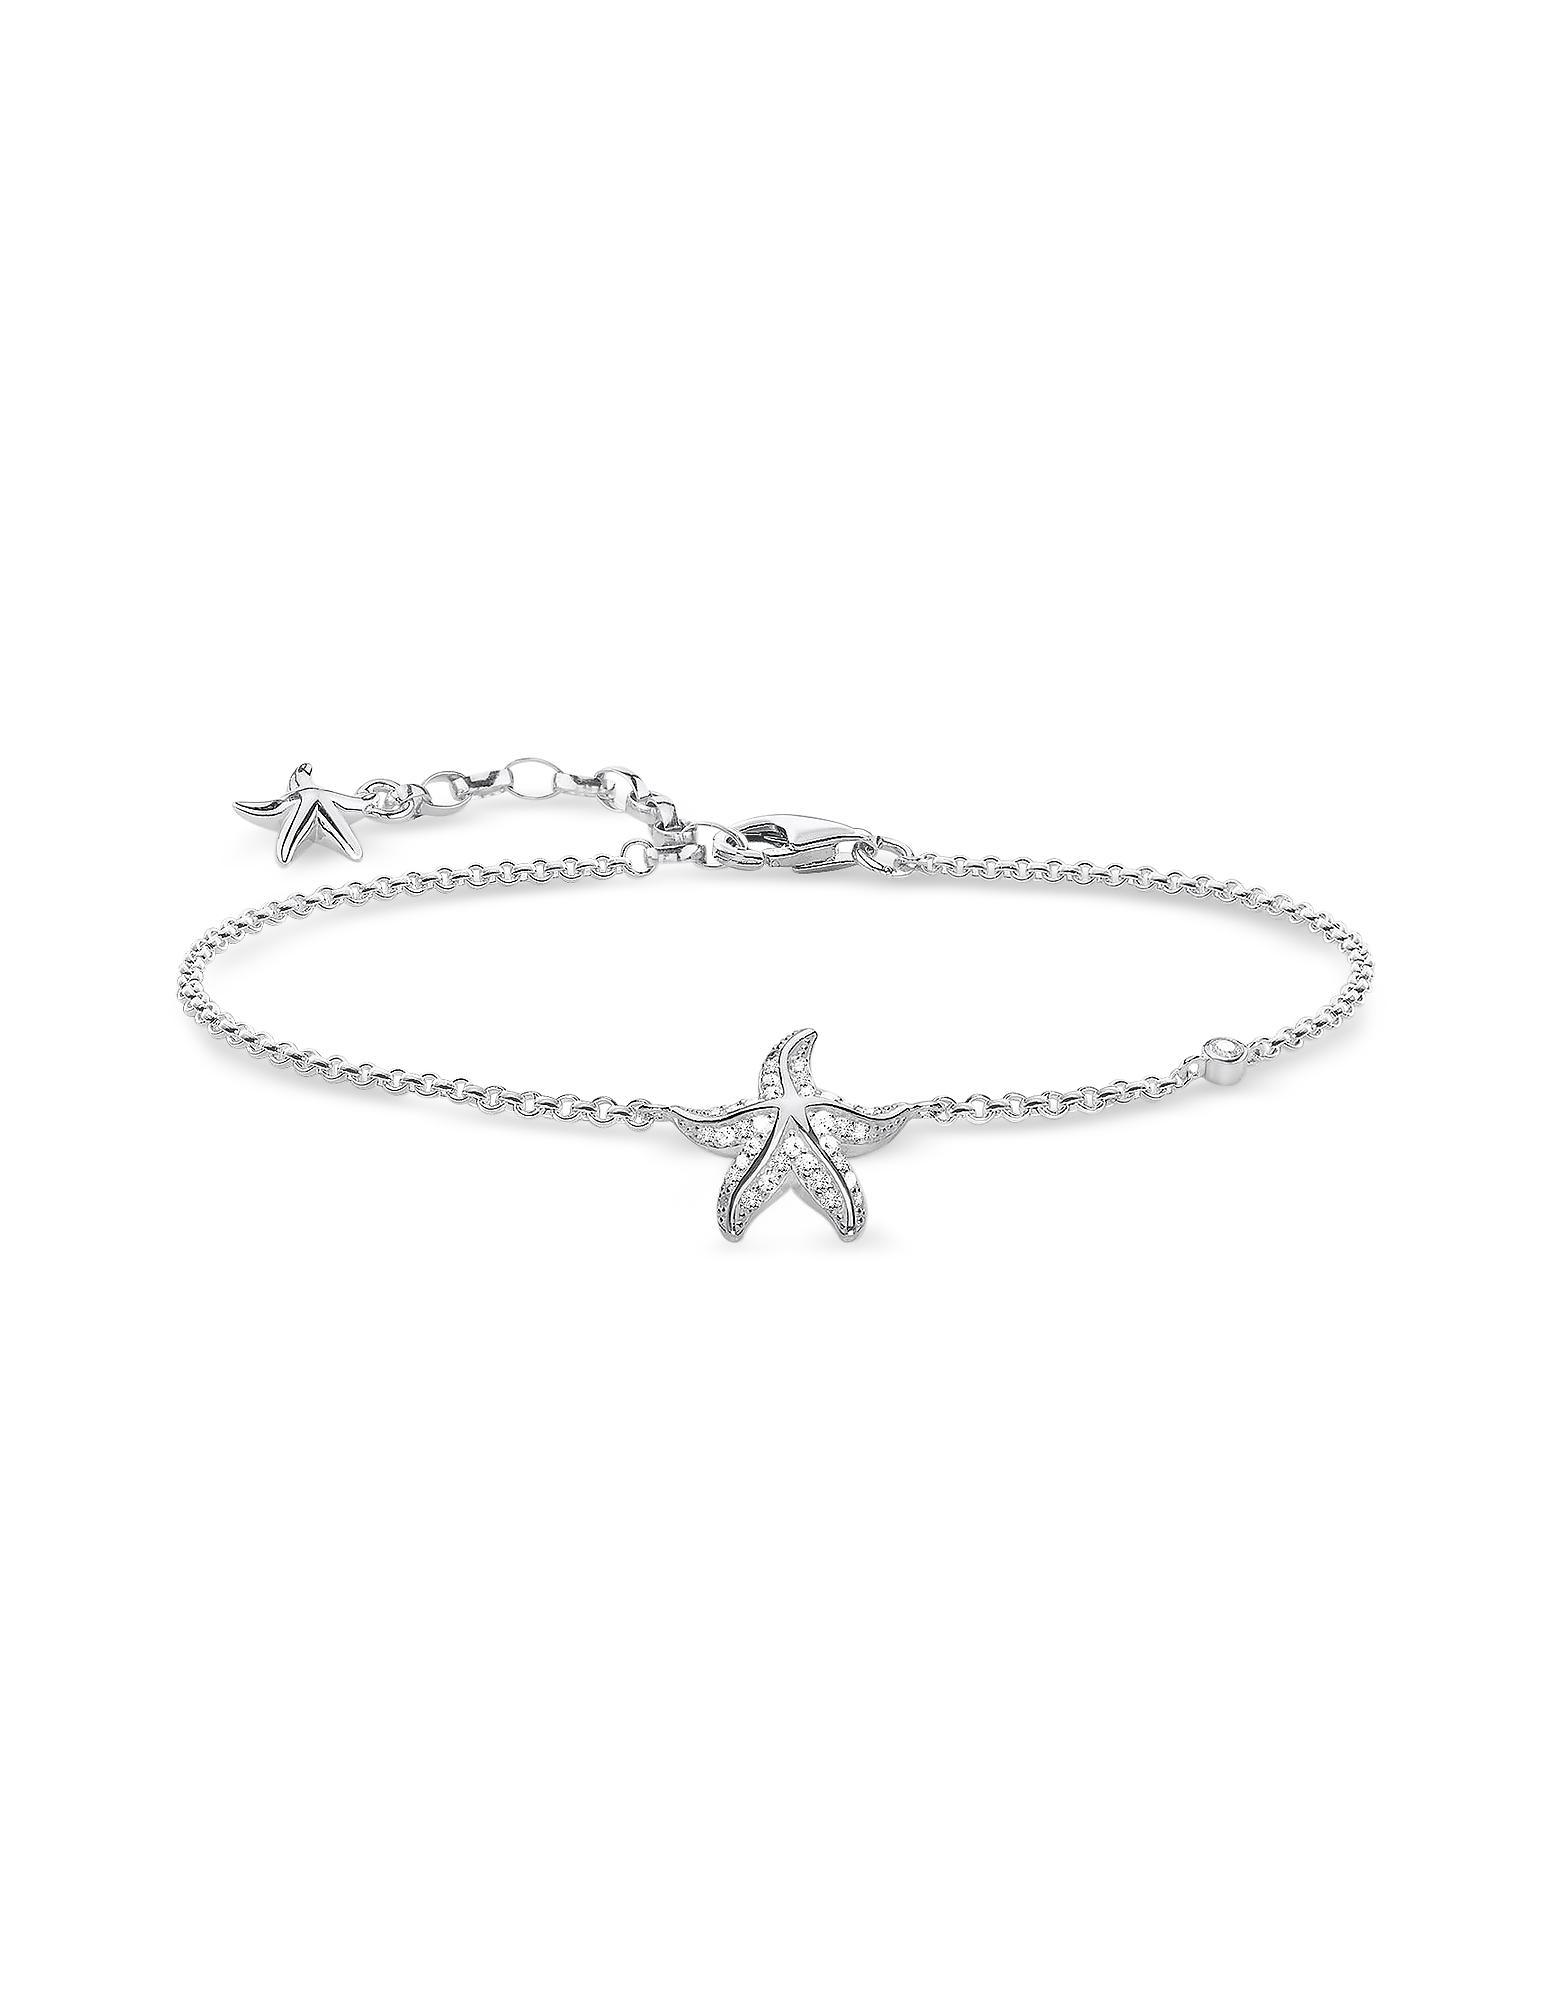 En Argent Sterling Bracelet étoile de mer w/Blanc Zircone